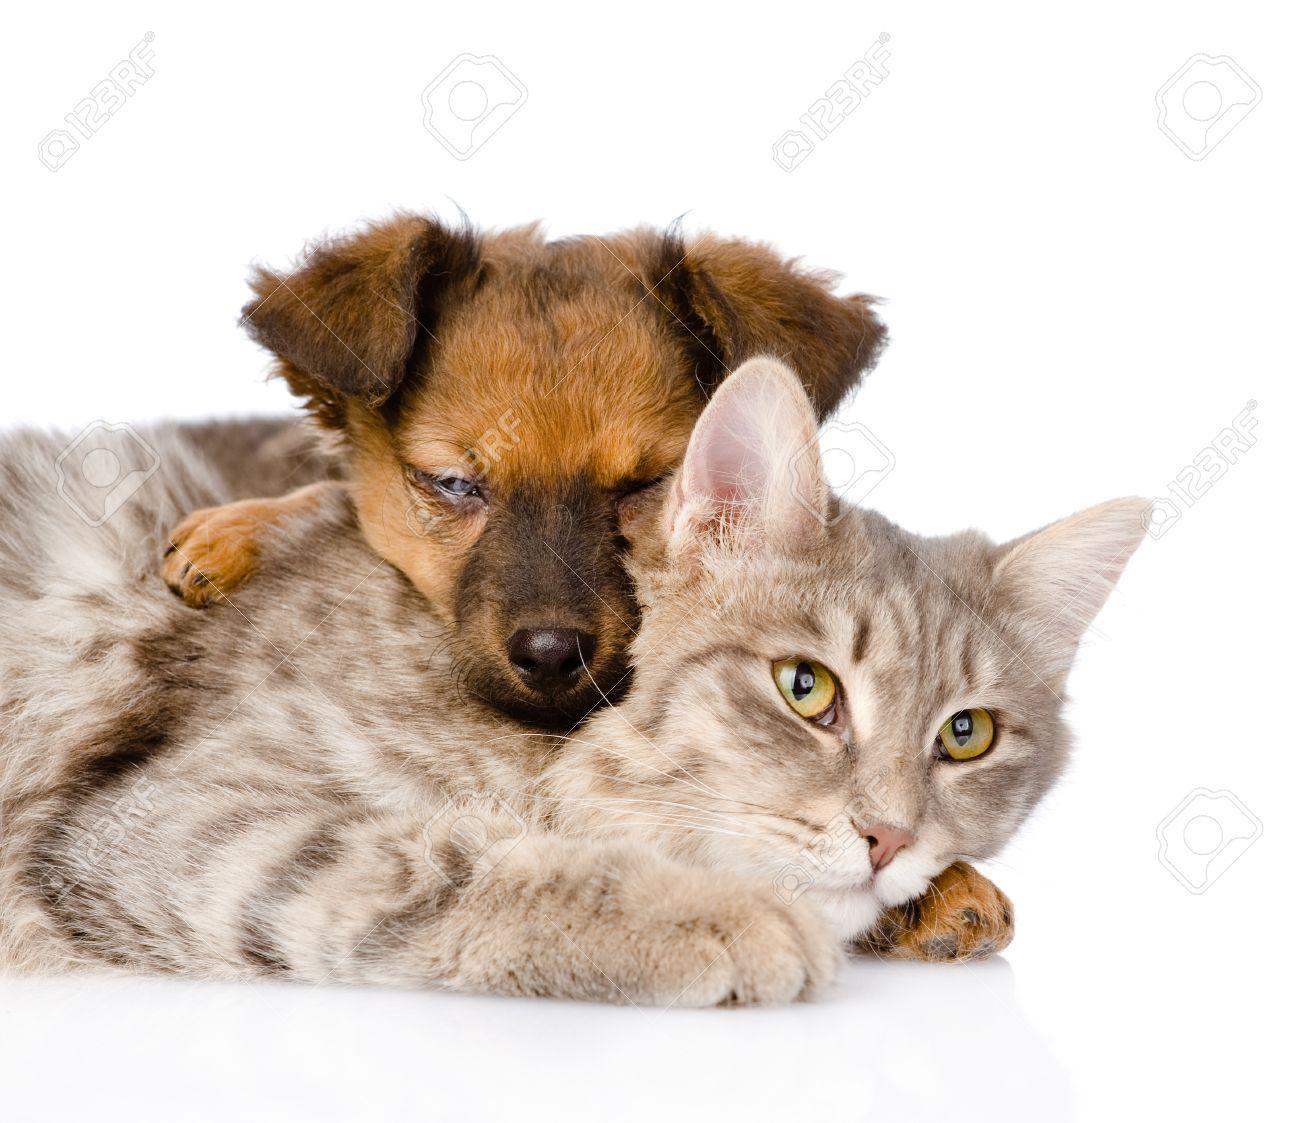 Cat Dog Breed Mix Mixed Breed Dog Hugging Cat